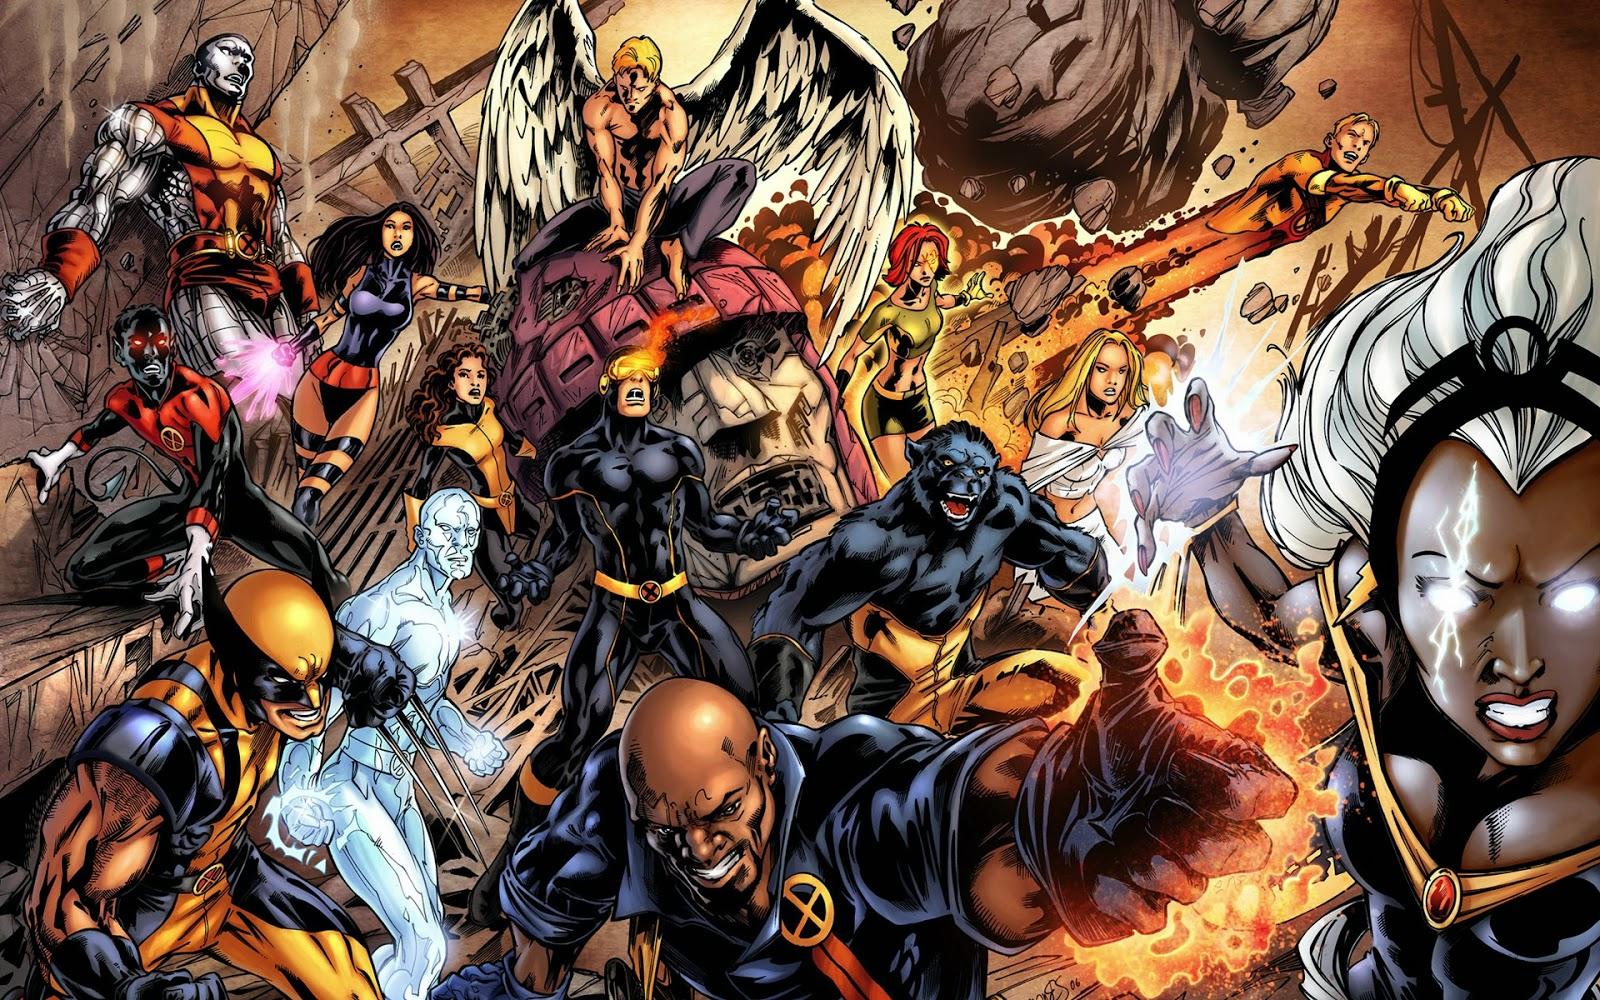 X-men, xmen, mutantes, fox, serie, marvel, el zorro con gafas, lobezno